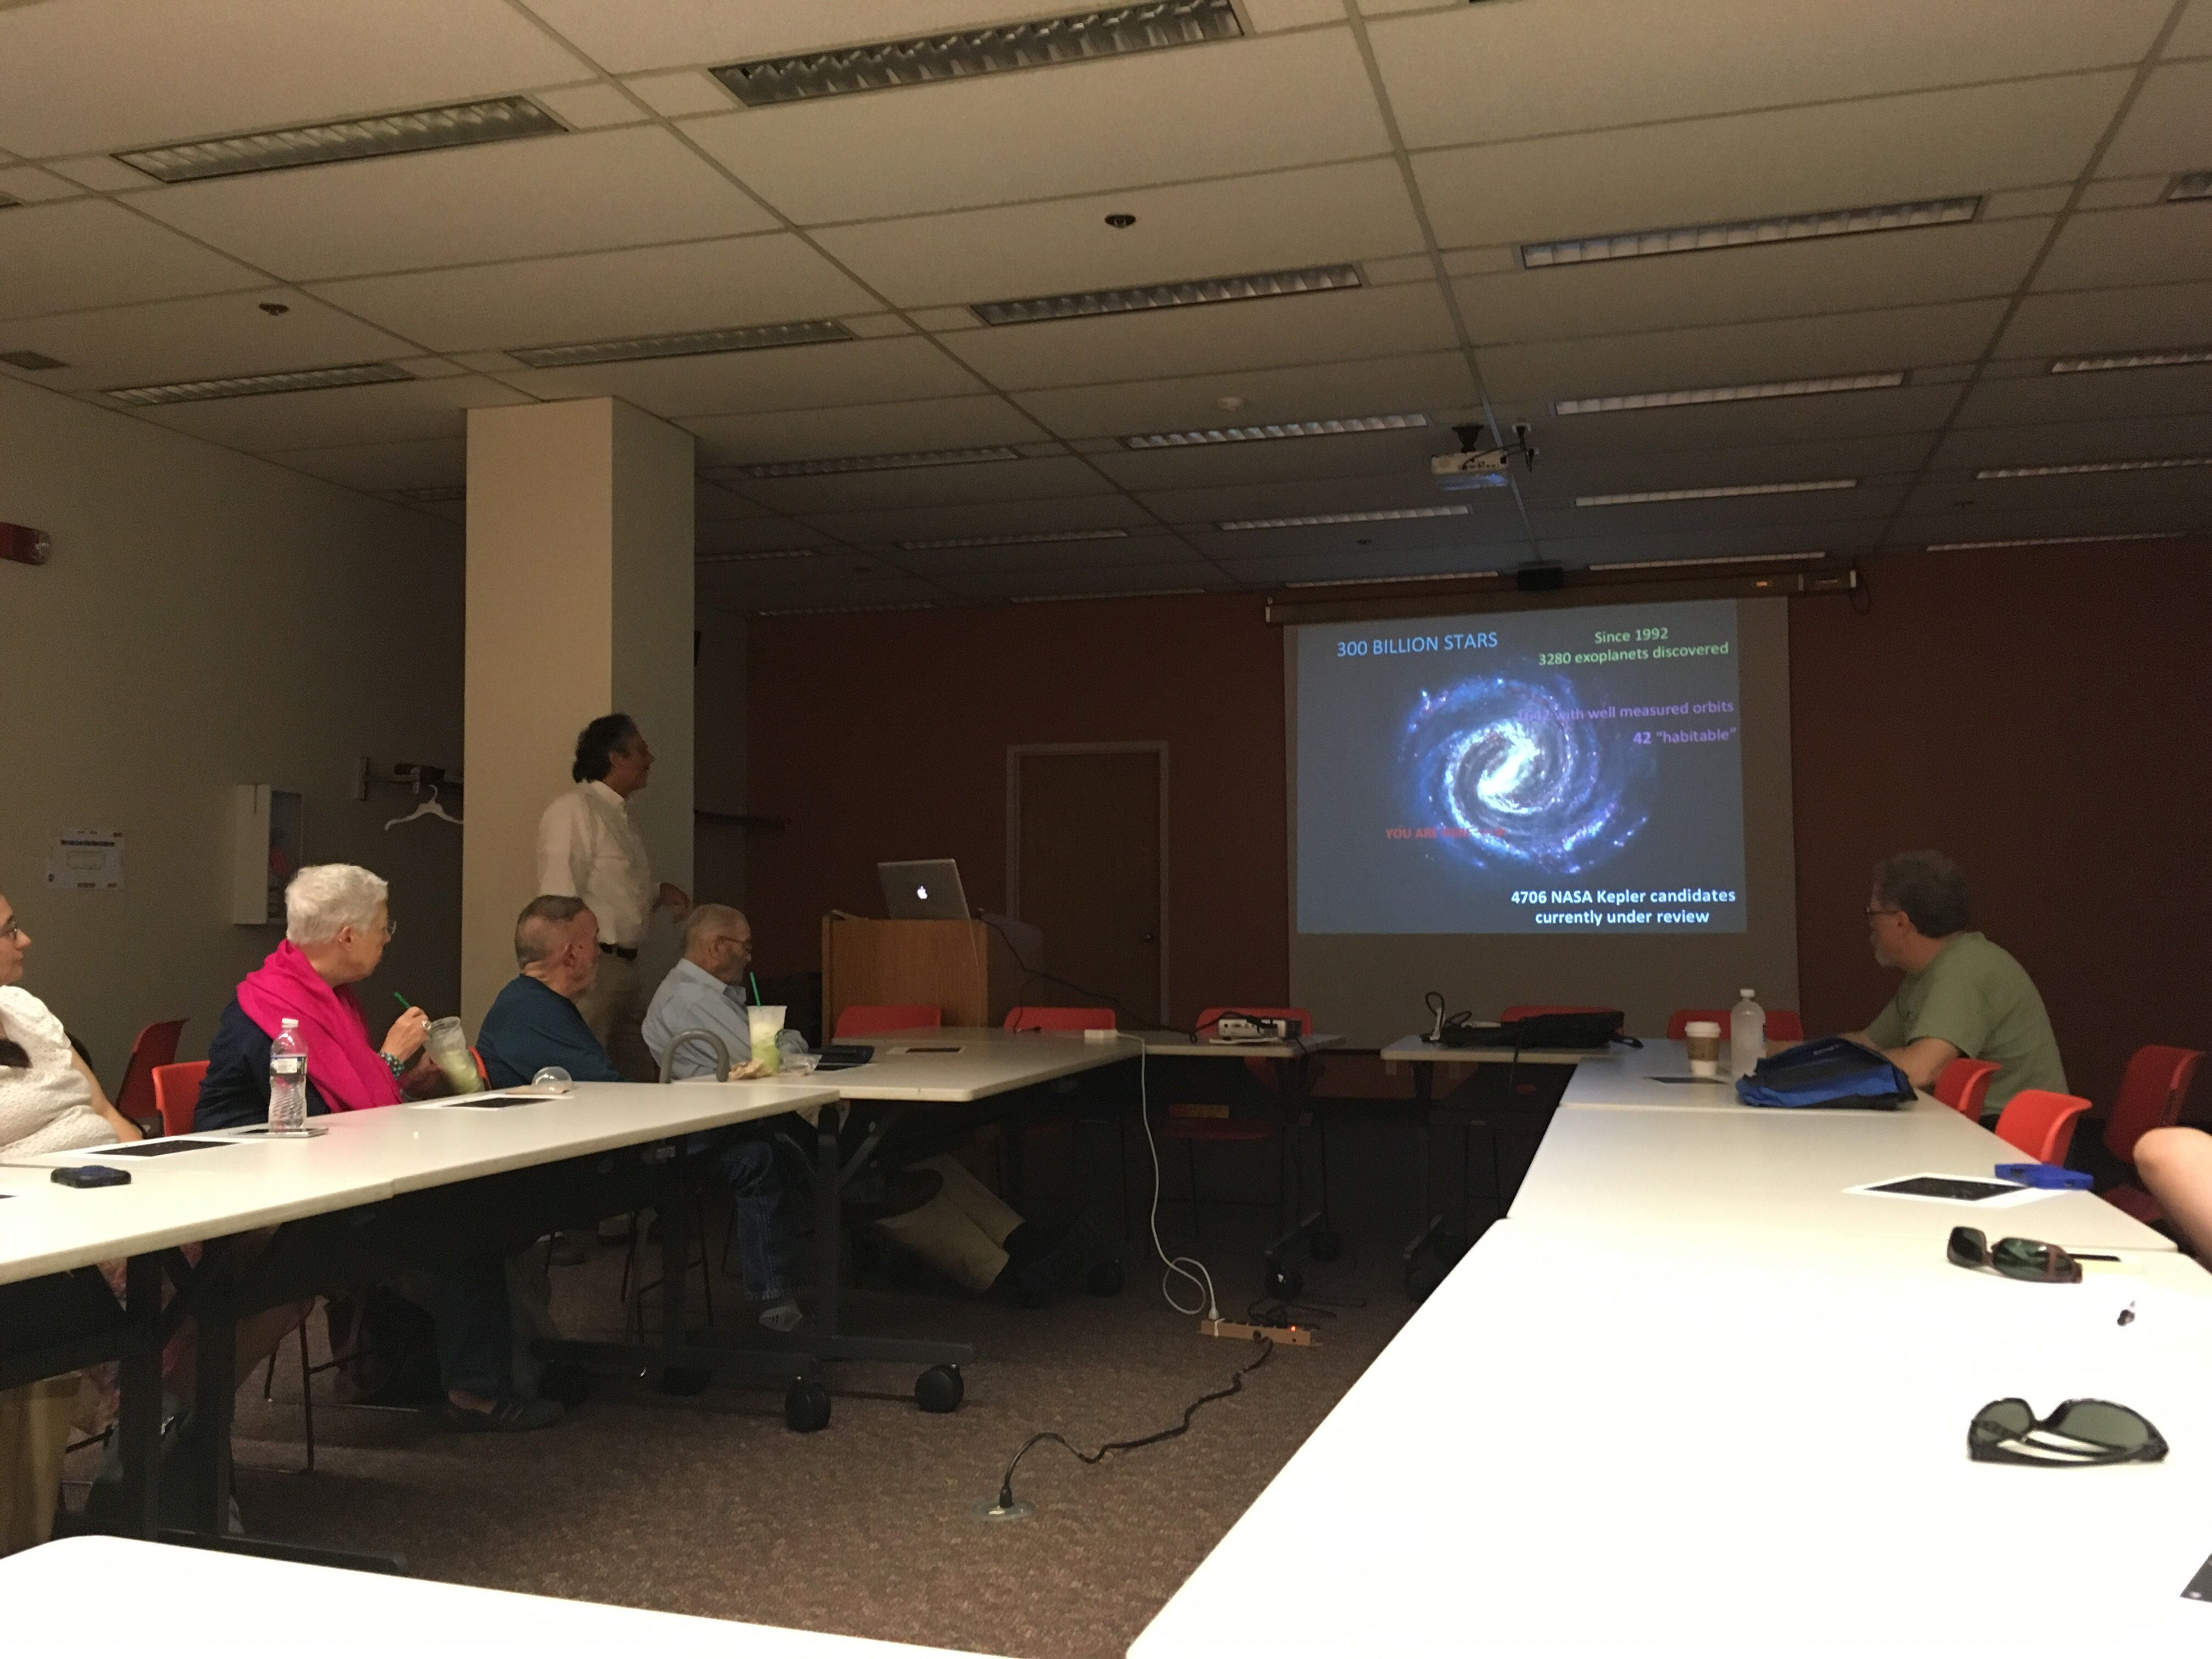 REASON (Rationalists, Empiricists And Skeptics Of Nebraska)